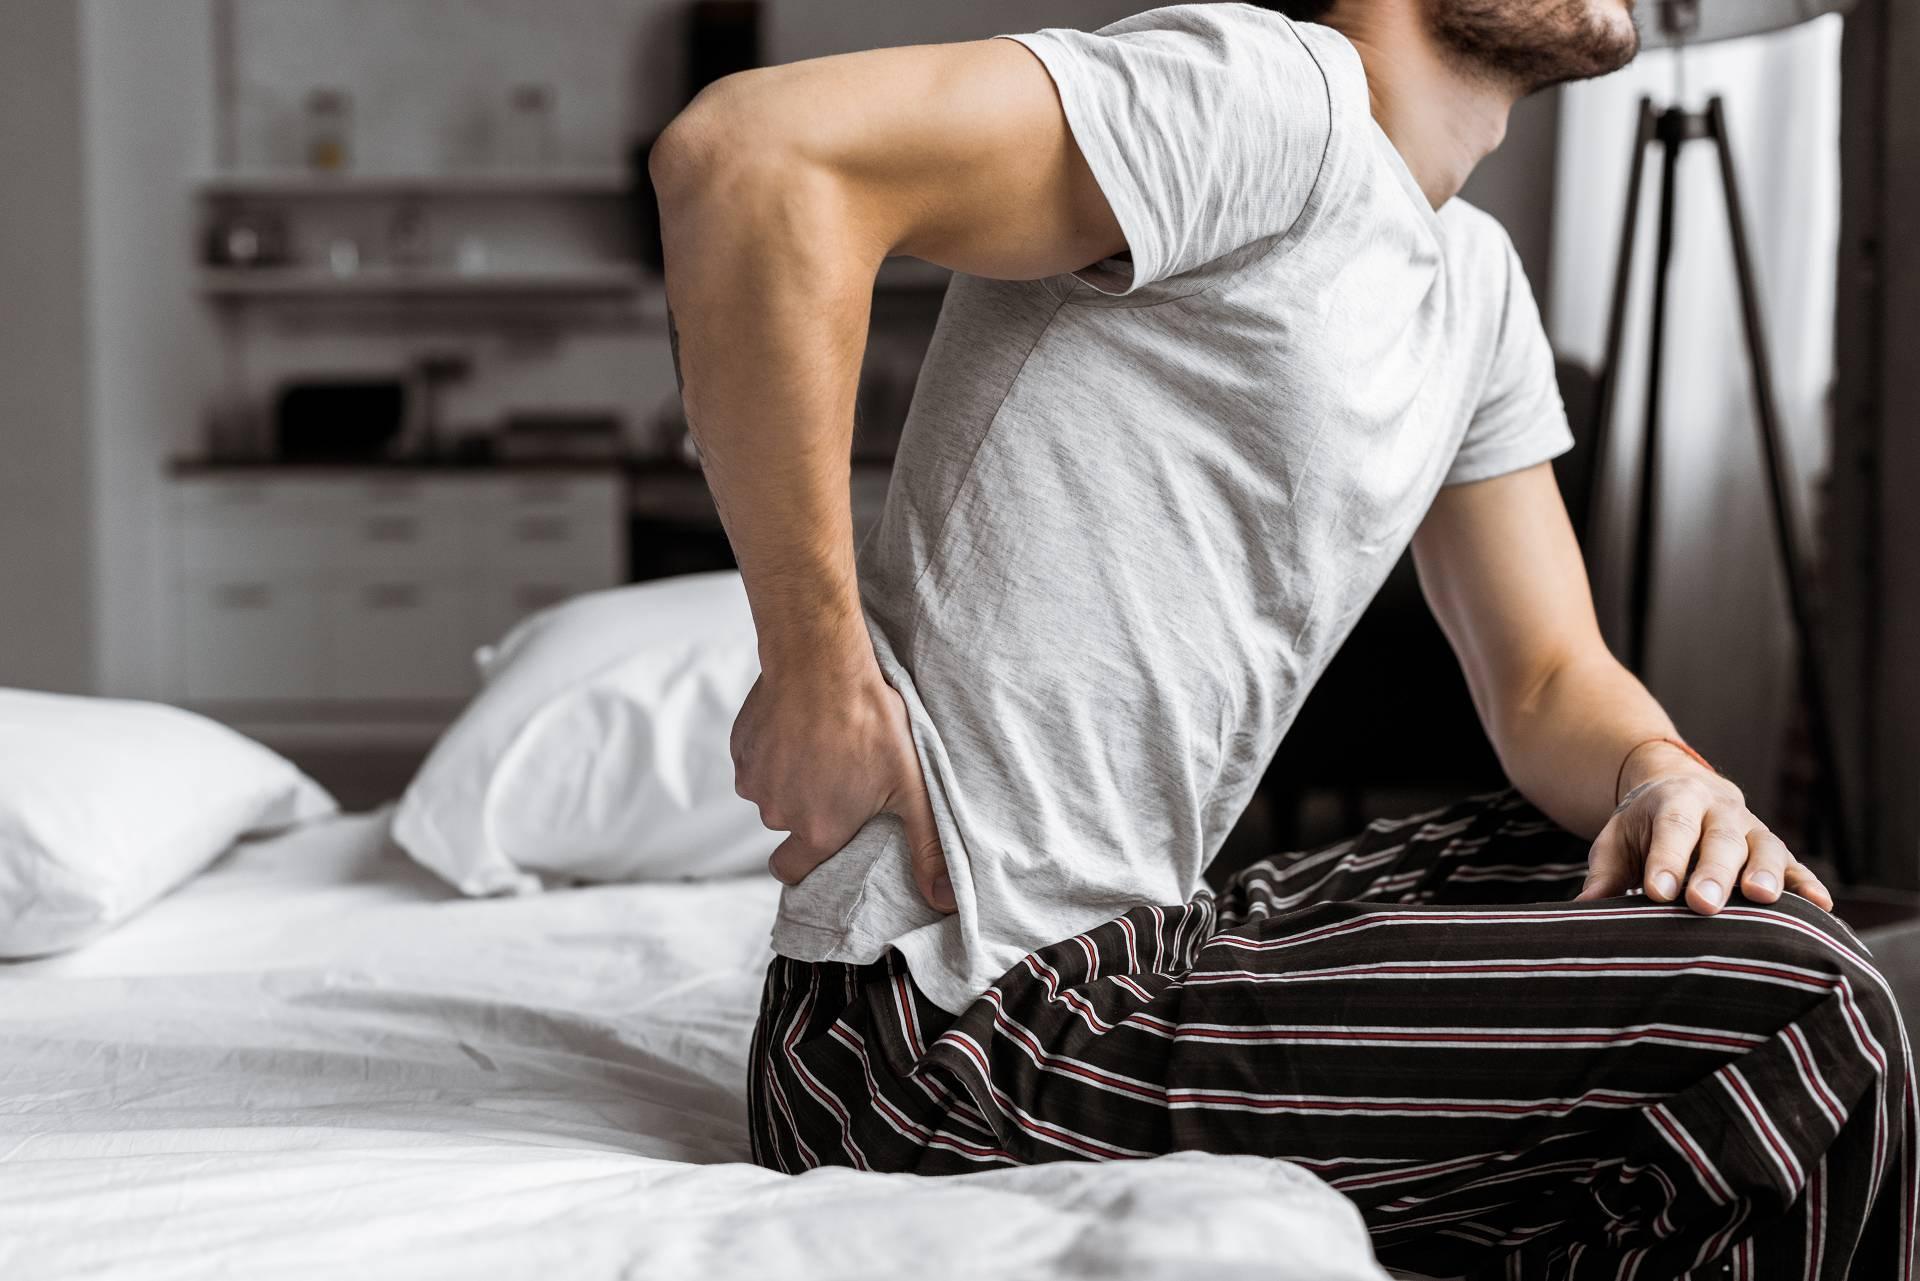 Schmerz lass nach: Krafttraining zur Behandlung unspezifischer Rückenschmerzen